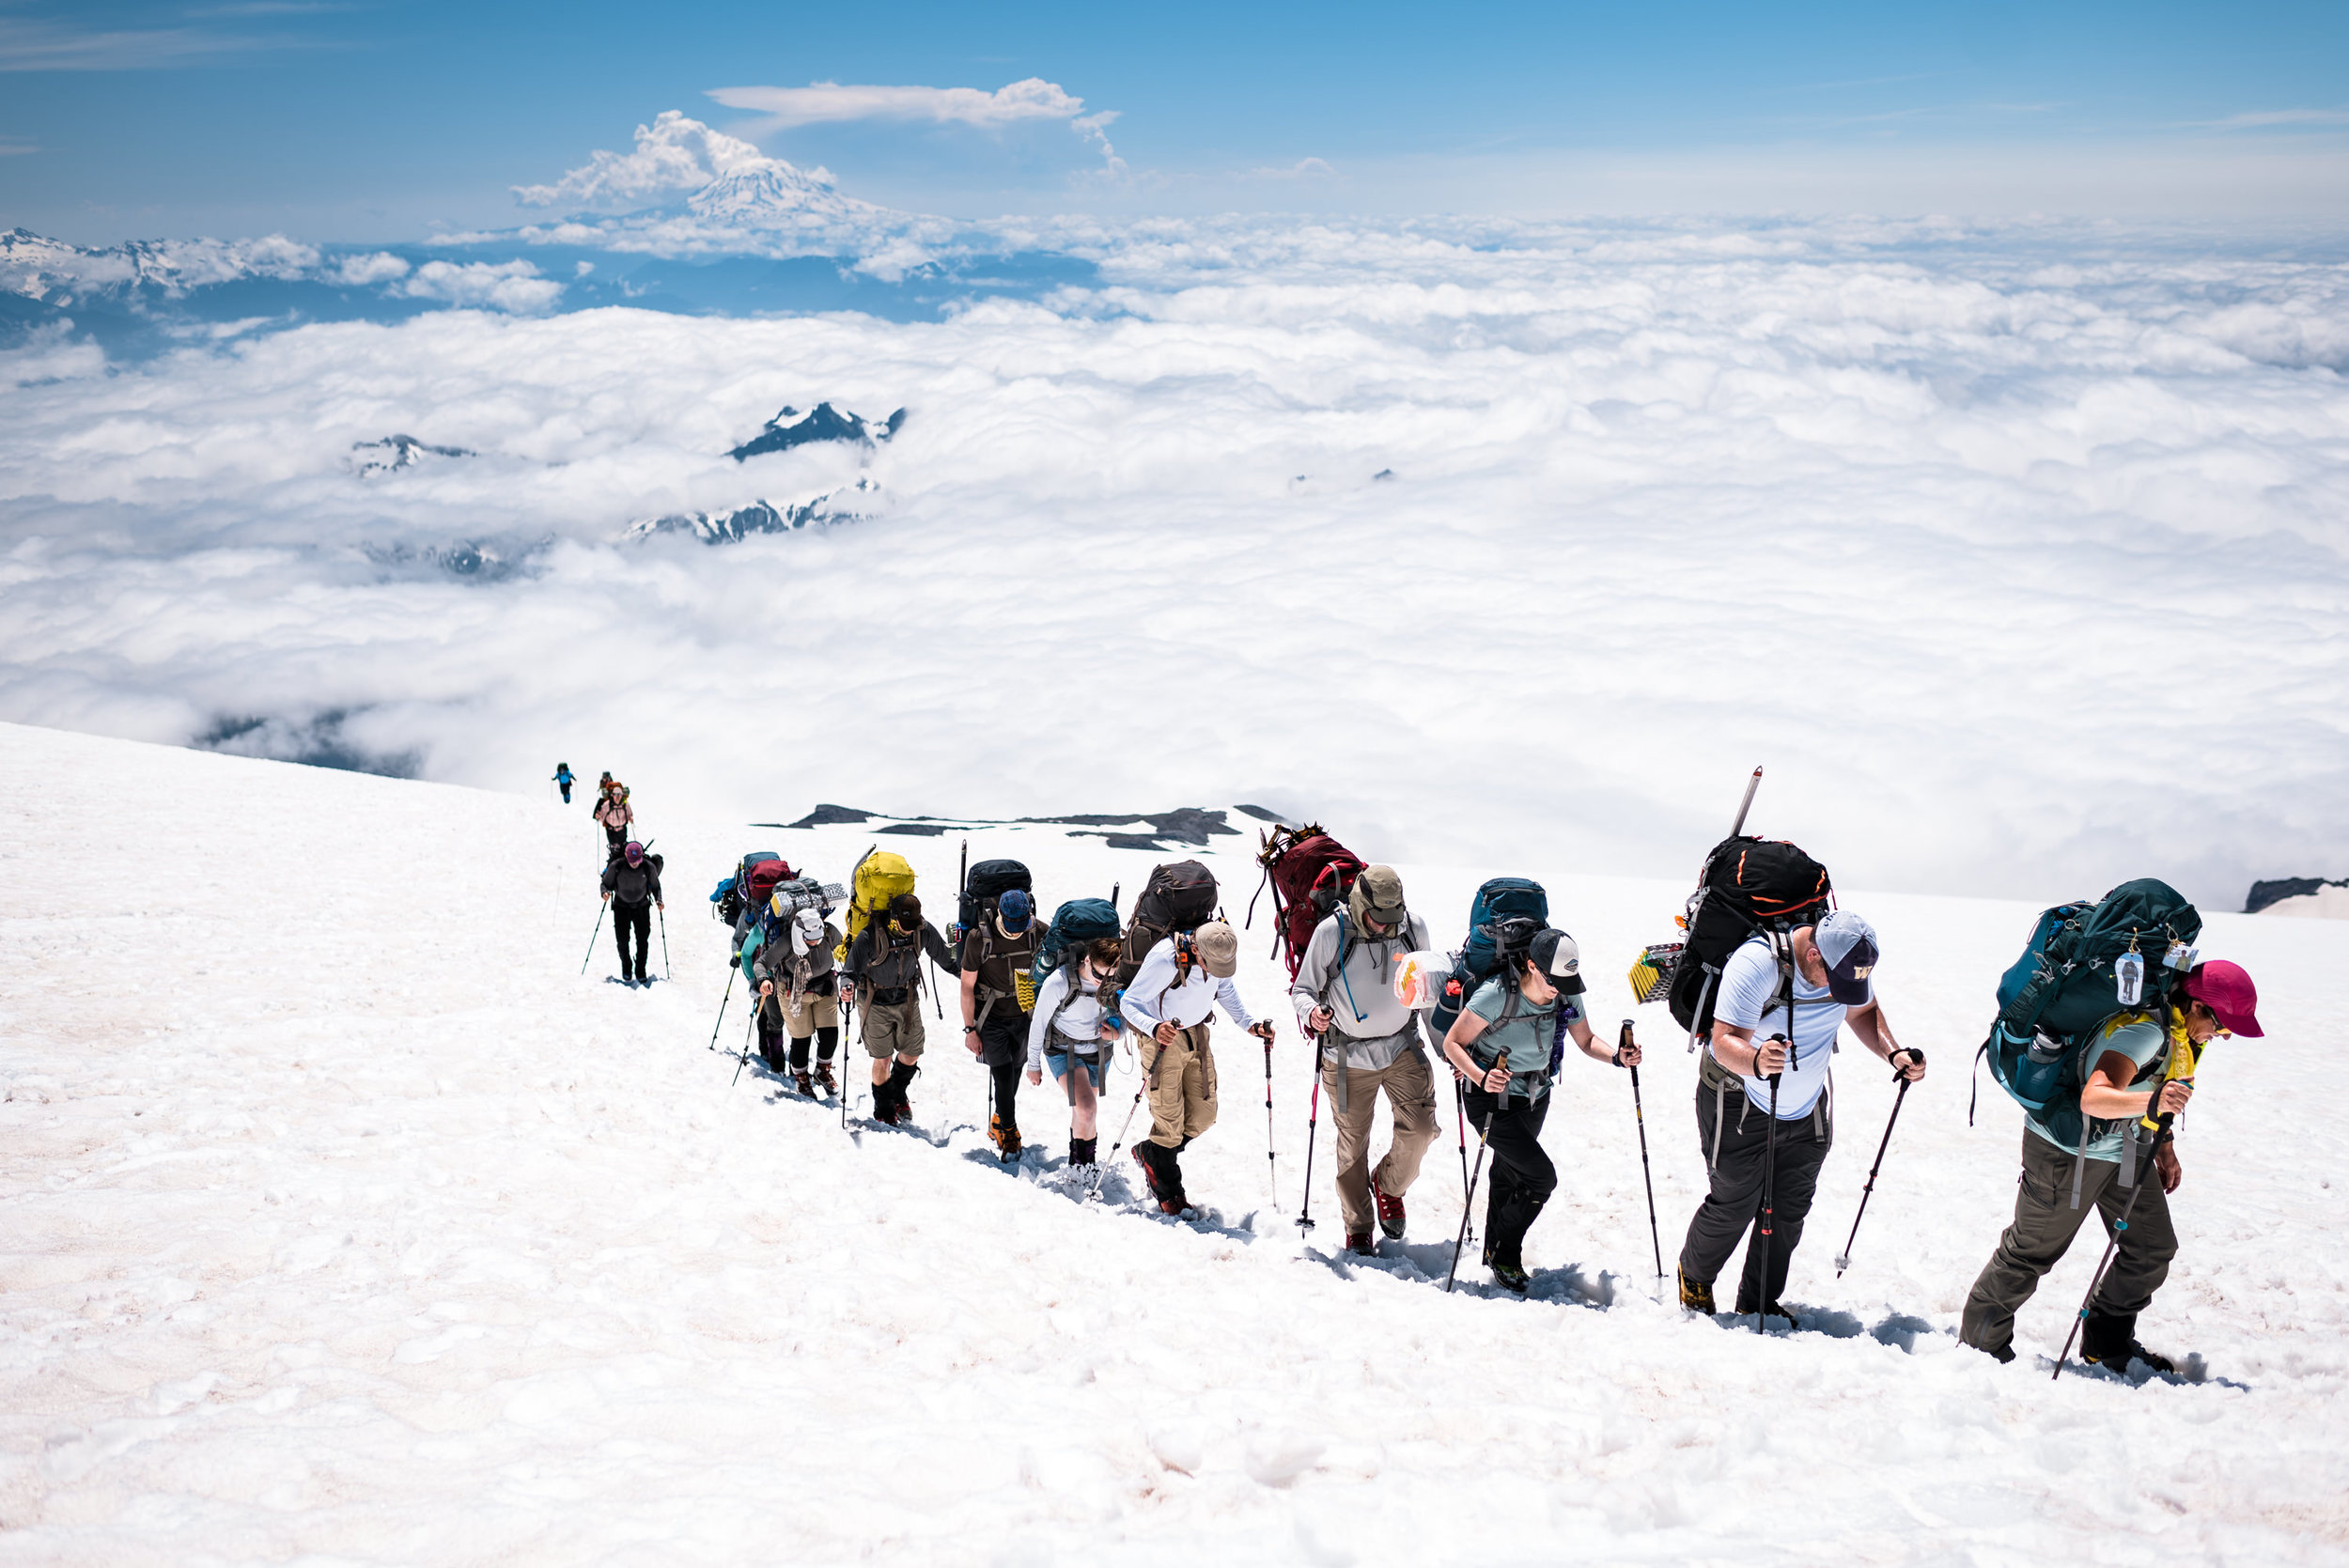 June 21, 2018 - Andrew Tat - Mount Rainier National Park - Mountaineering, Outdoors - 07.JPG